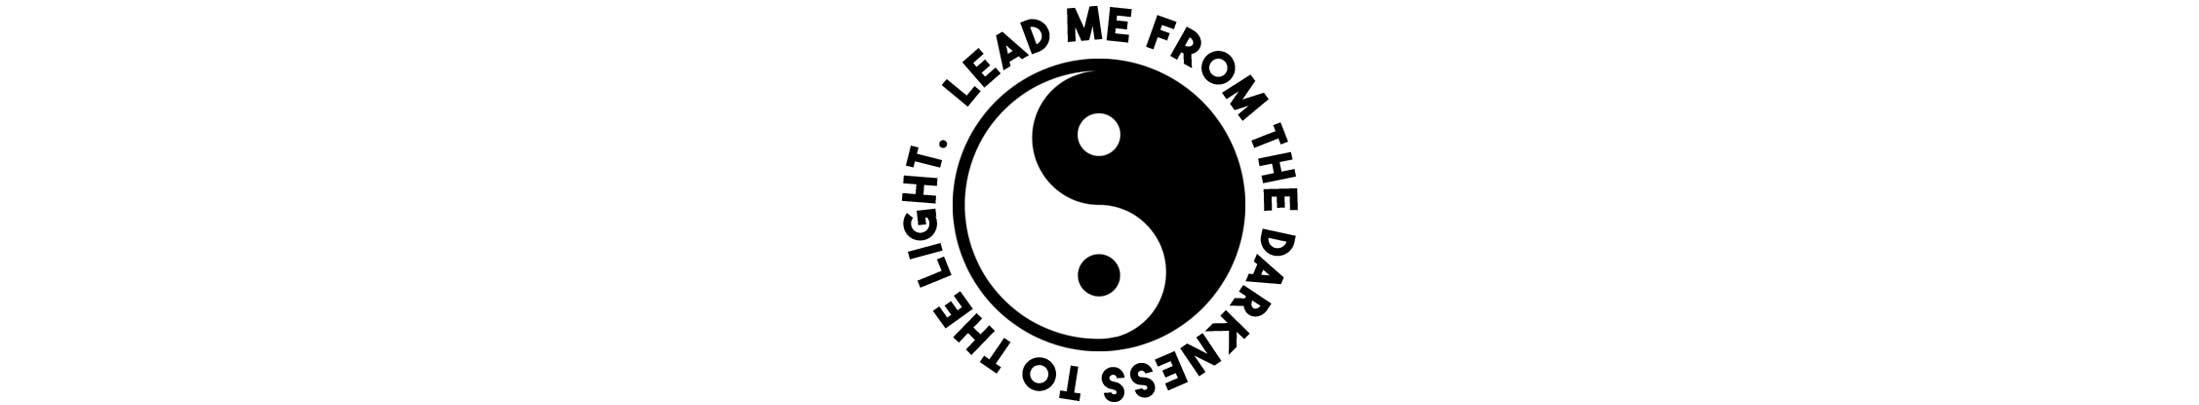 yin-yang_light-to-dark.jpg